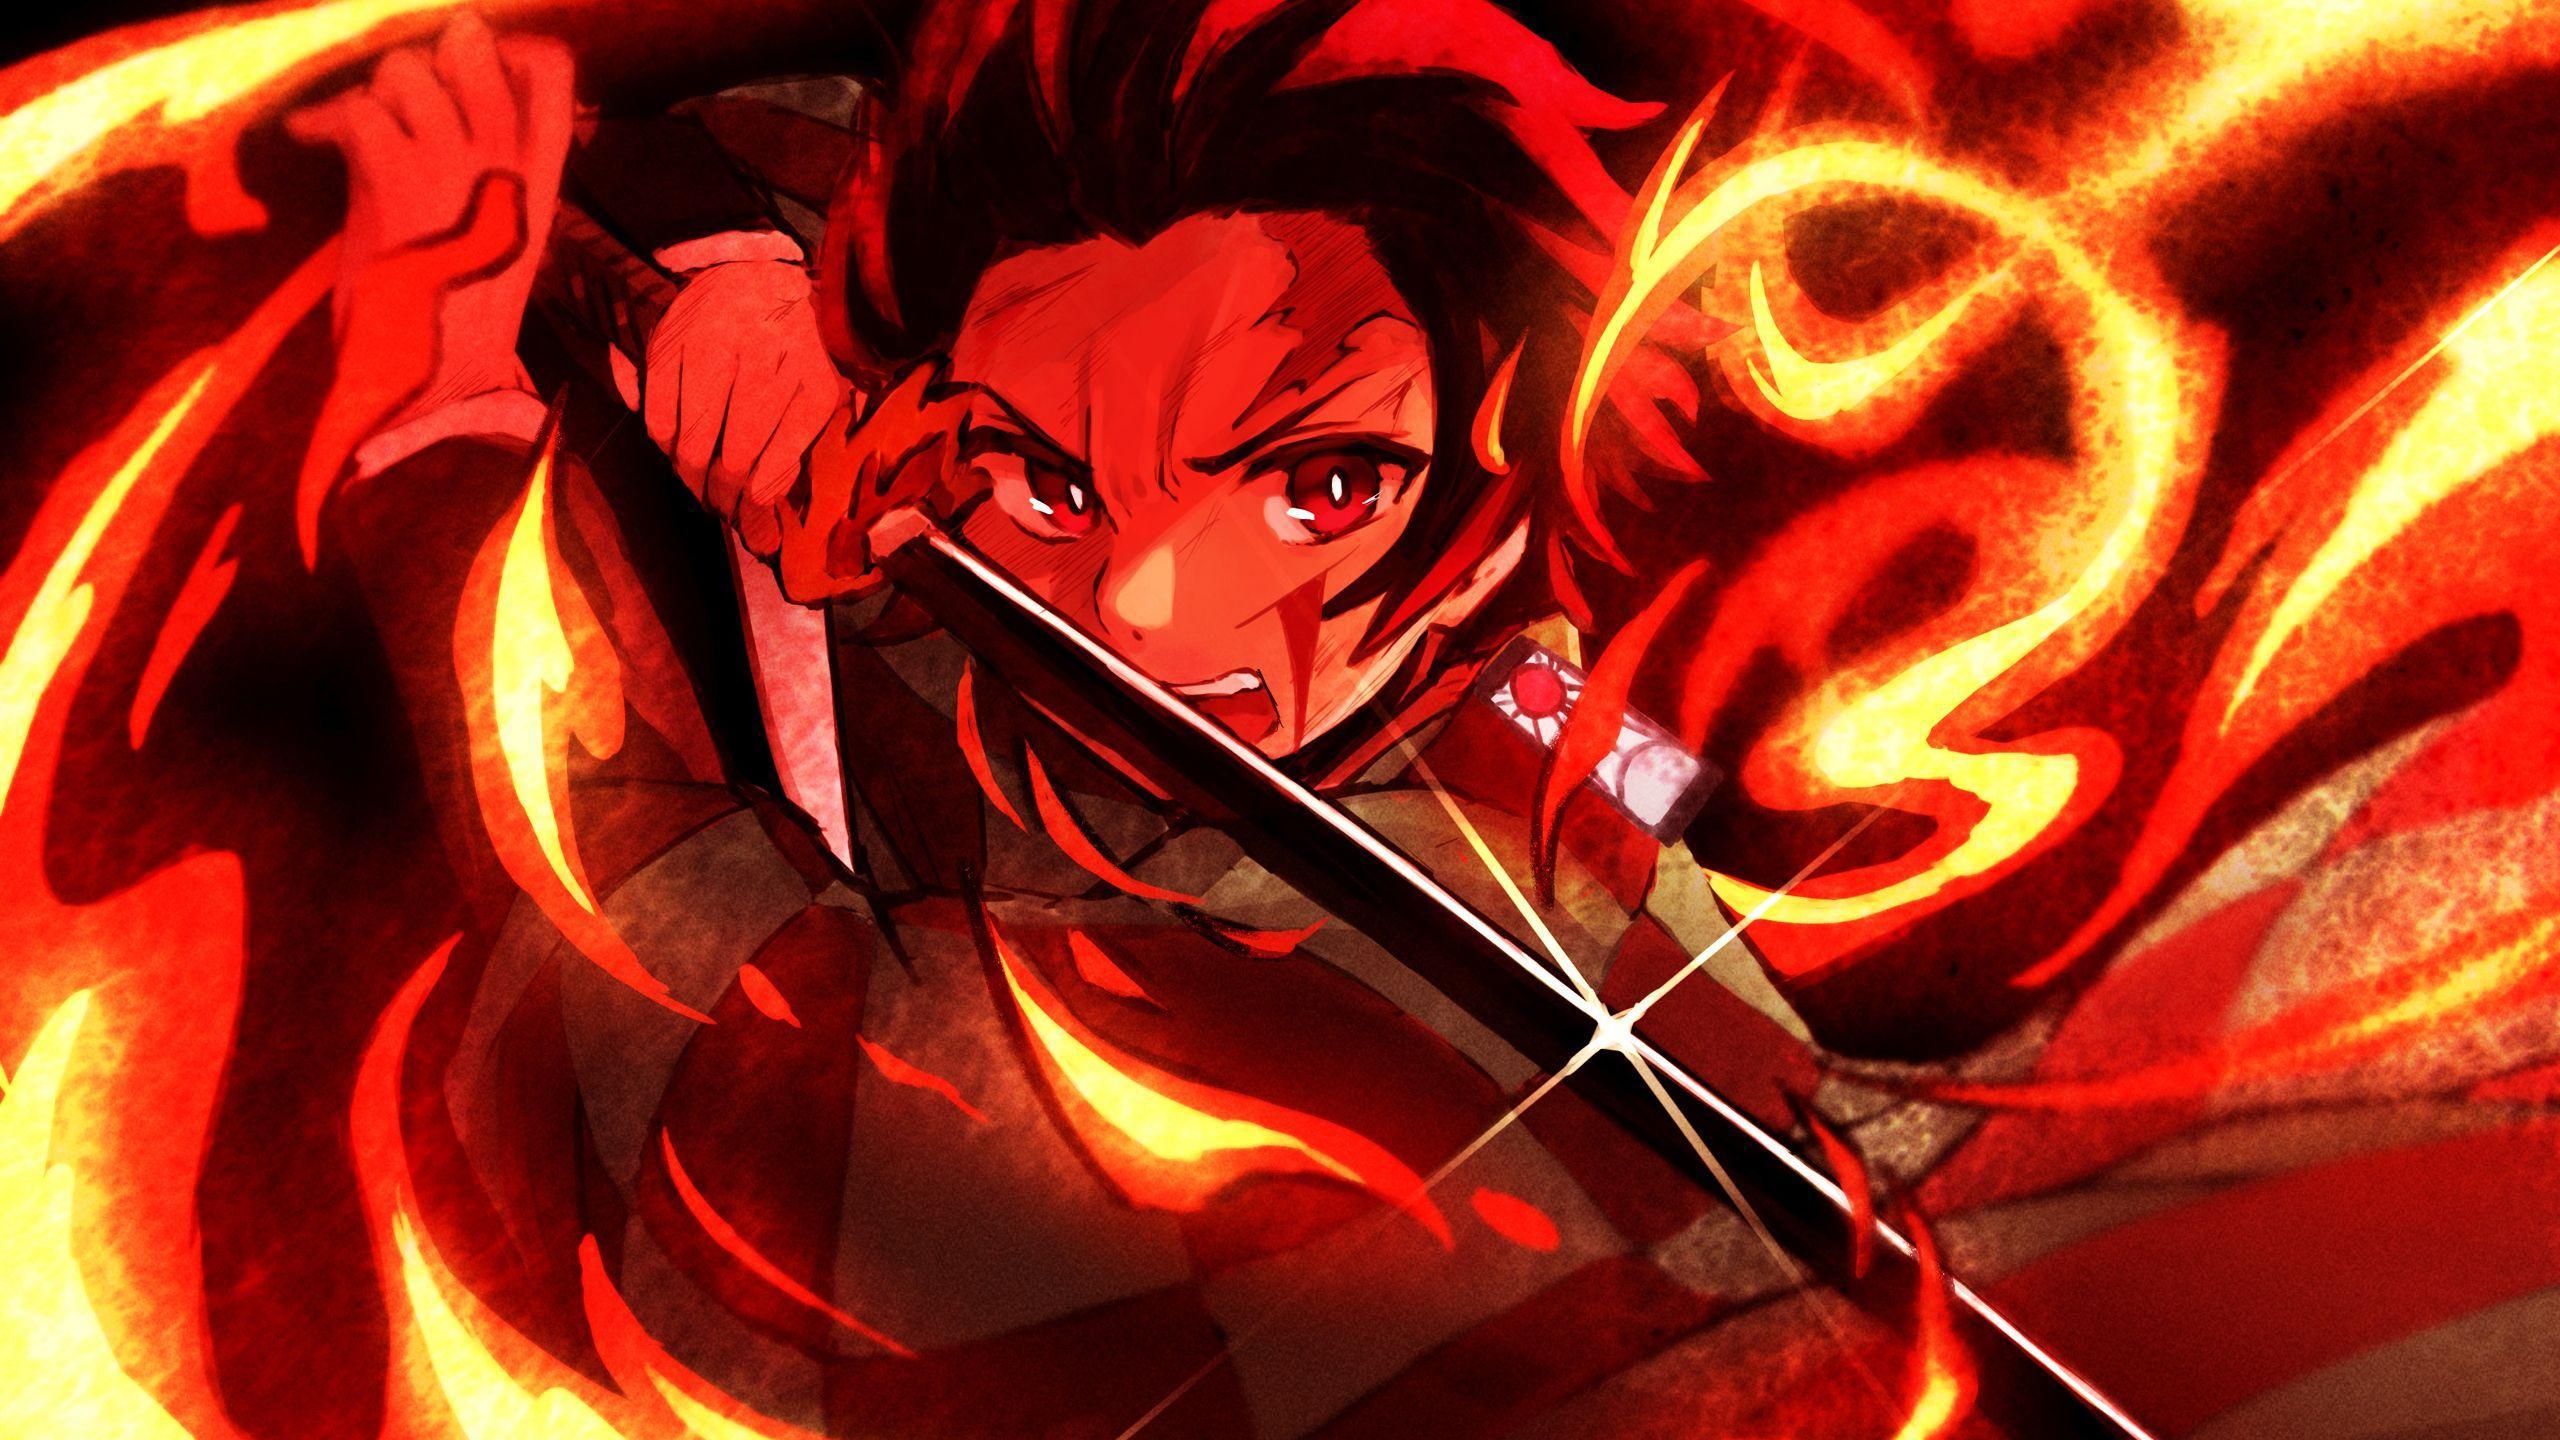 30/04/2021· kyojuro rengoku (煉れん獄ごく 杏きょう寿じゅ郎ろう rengoku kyōjurō?) is a major supporting character of demon slayer: Demon Slayer Fire Wallpapers - Top Free Demon Slayer Fire ...